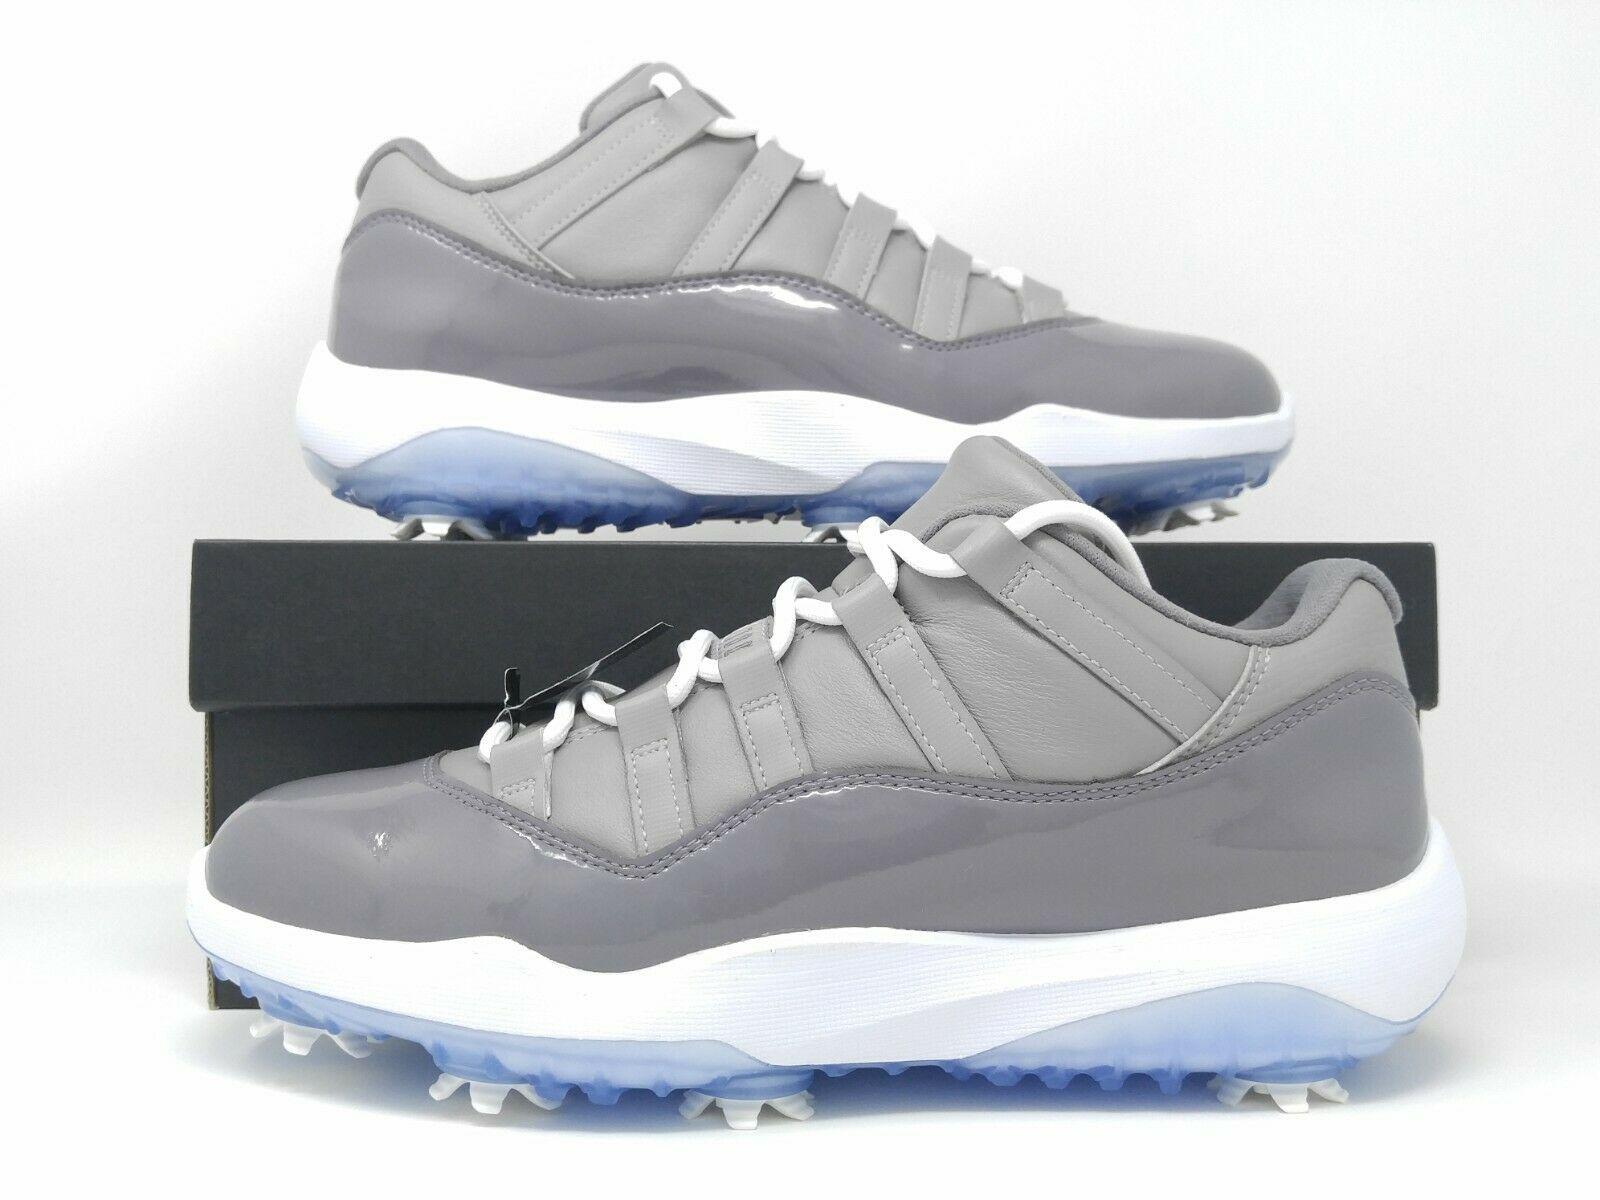 Jordan 11 Retro Low Golf Cool Grey